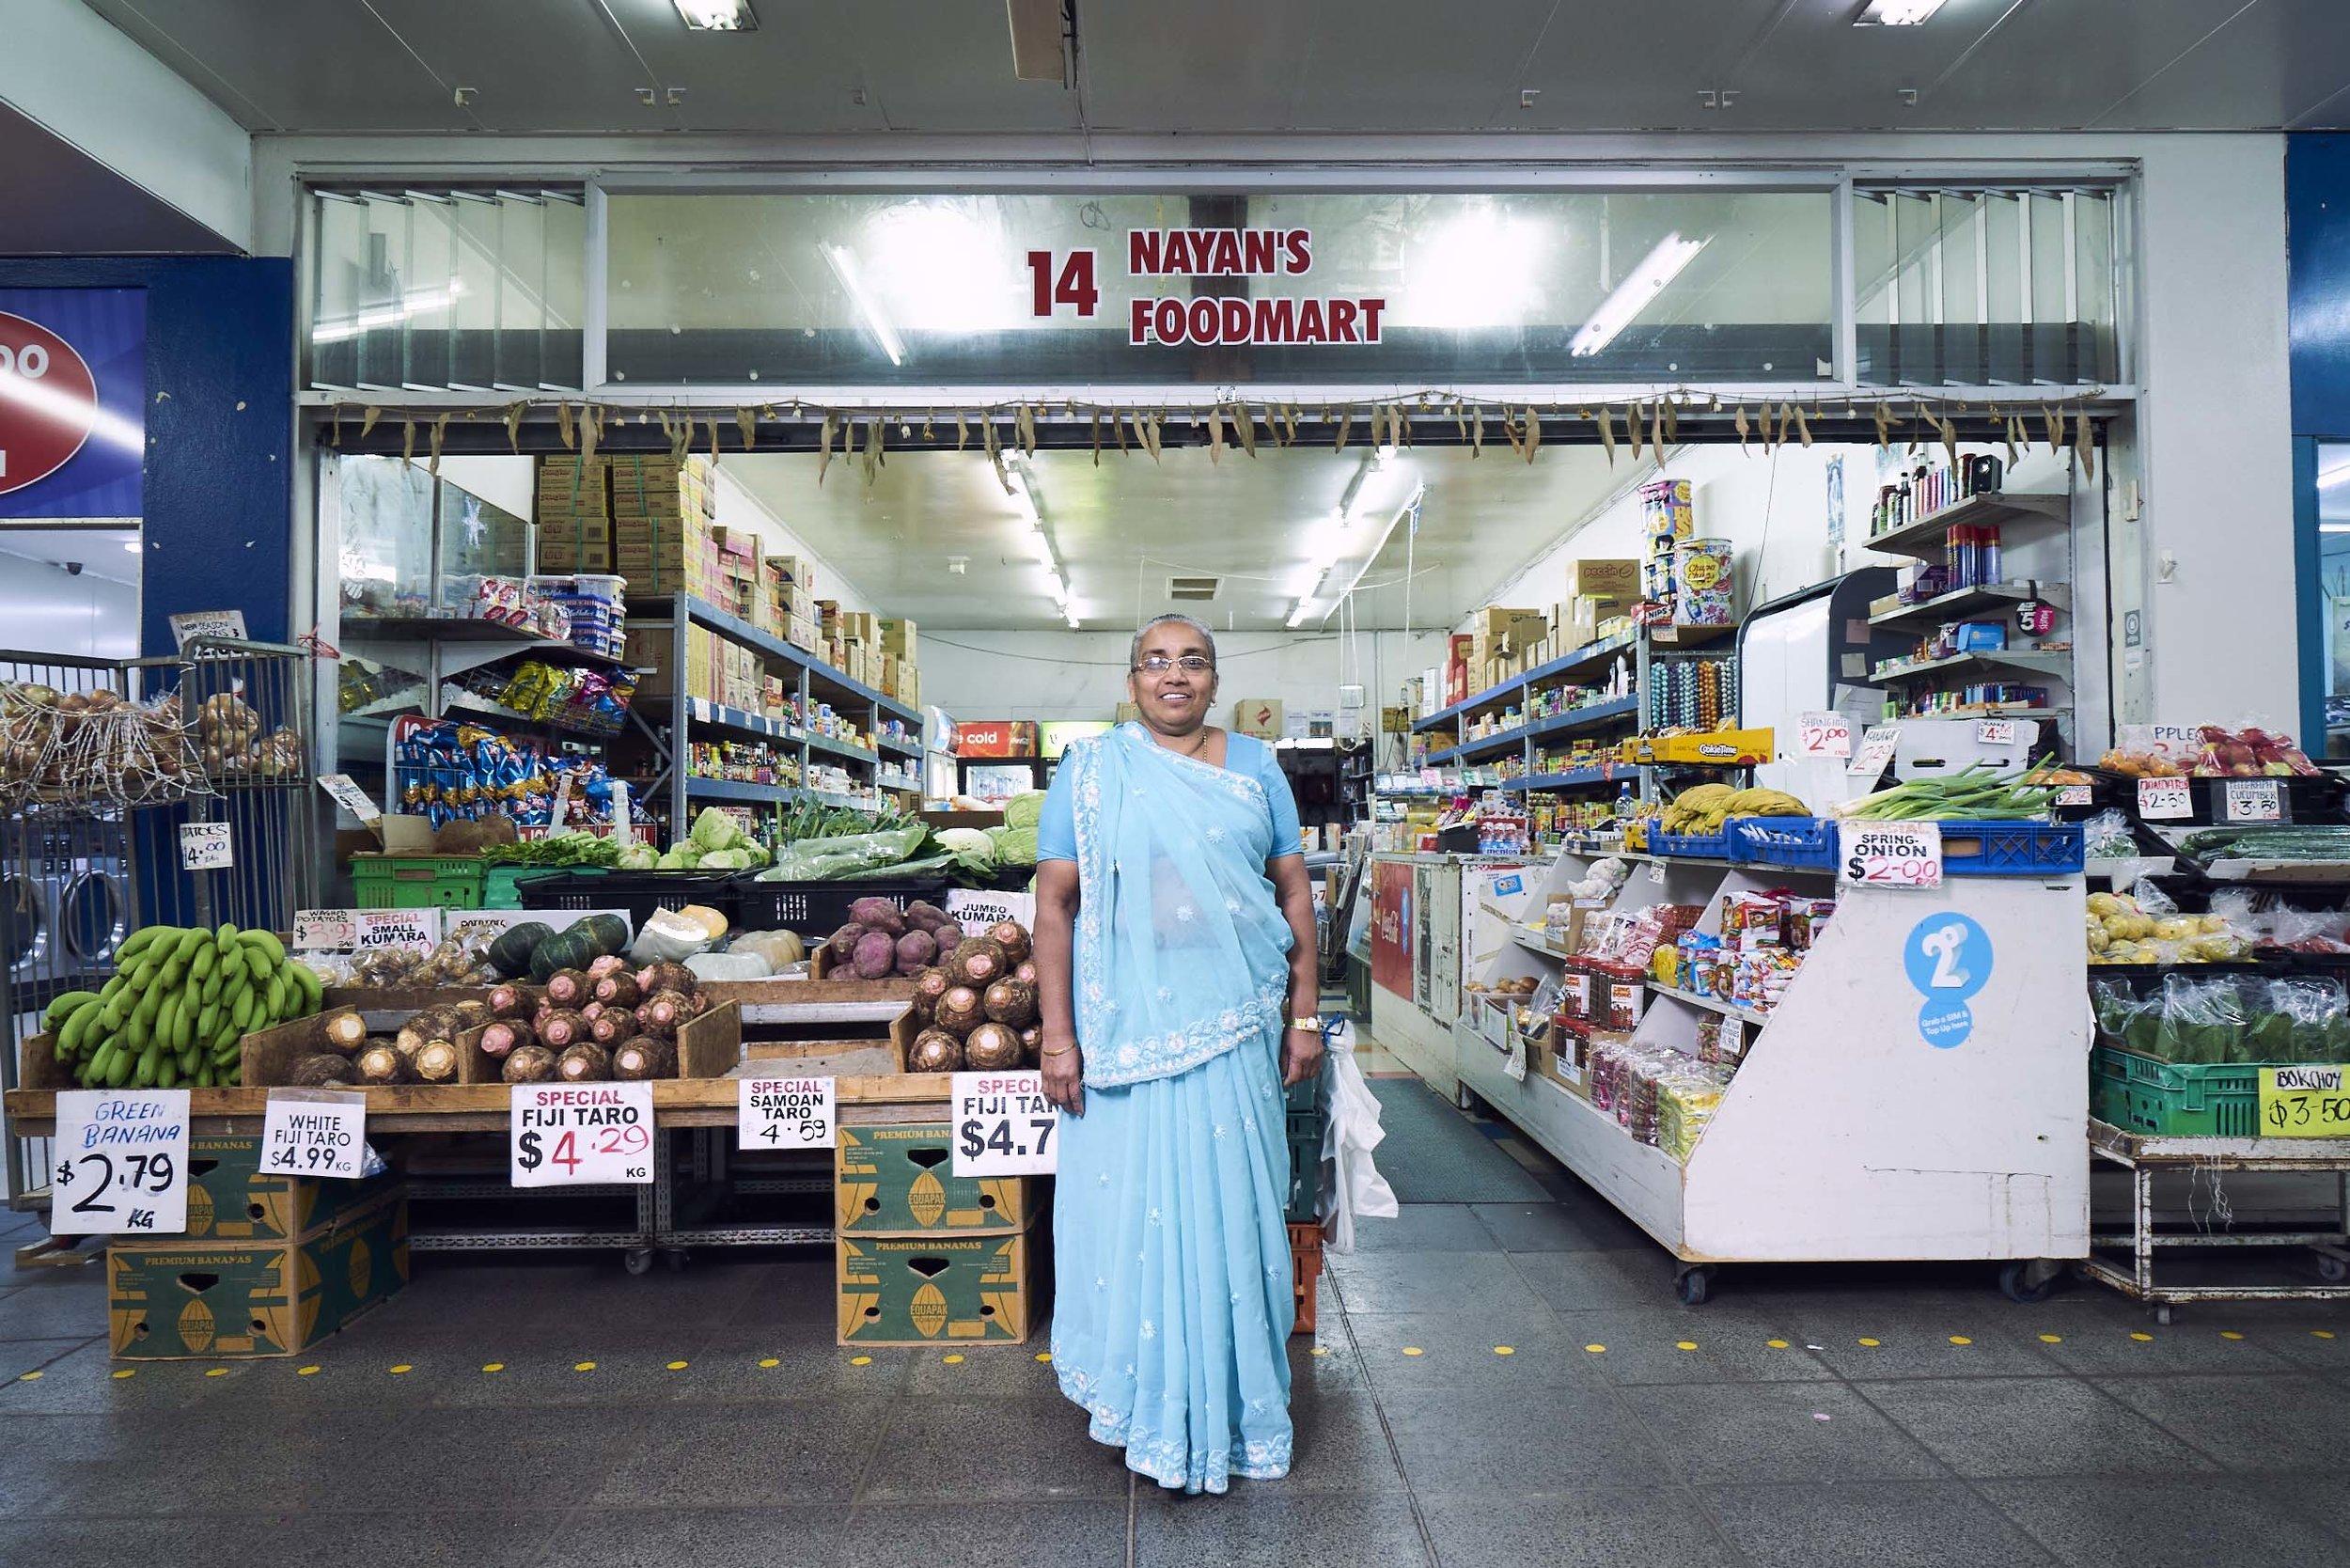 Kusum Kanji, Nayan's Food Mart, 2018 by Vinesh Kumaran